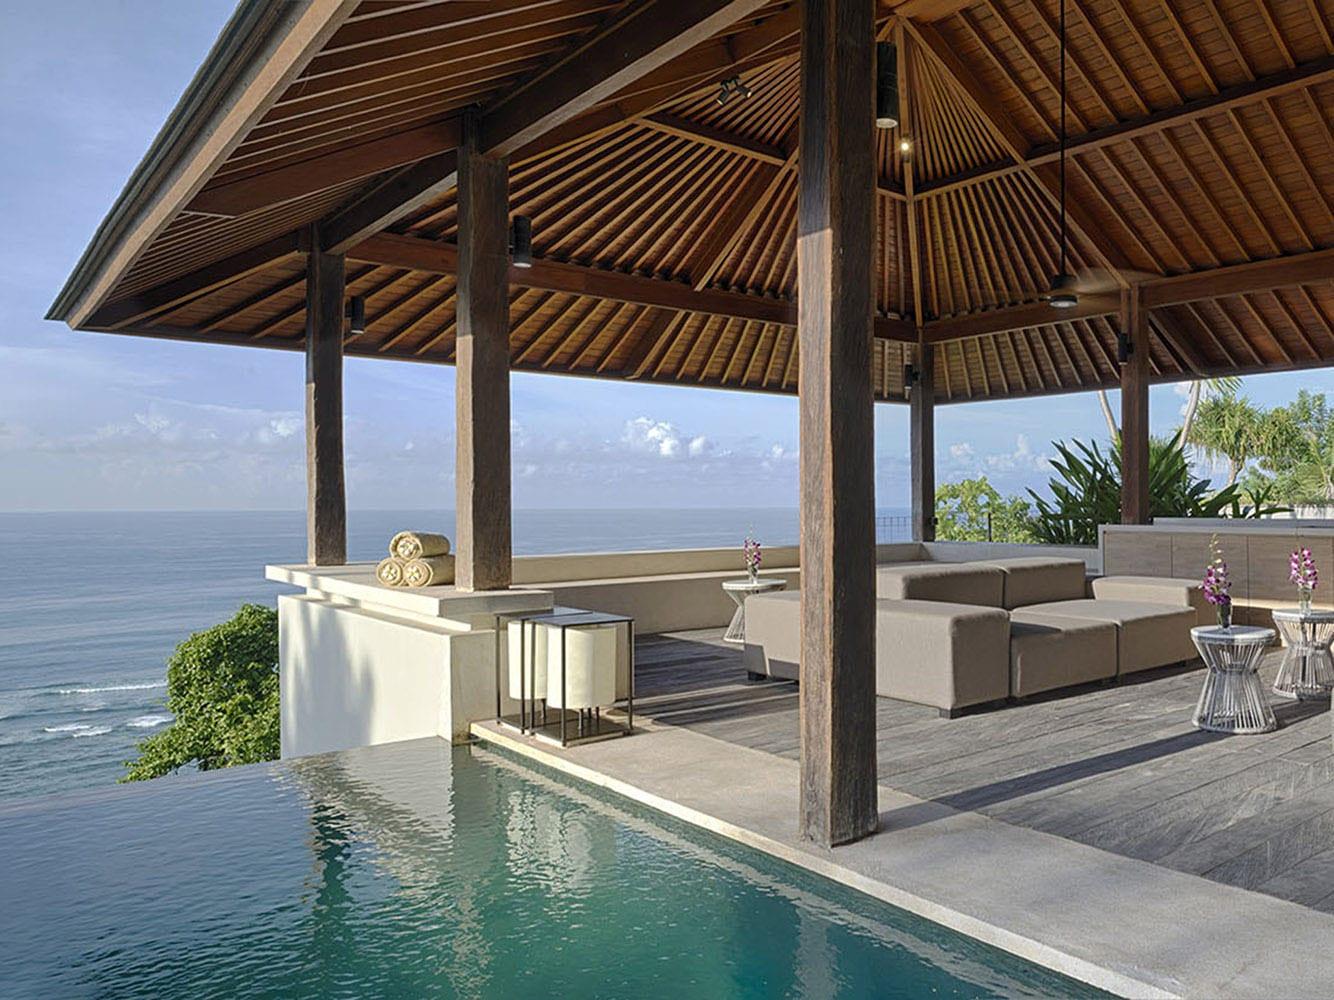 Bali Luxury Villa Rentals & Yacht Charter Indonesia